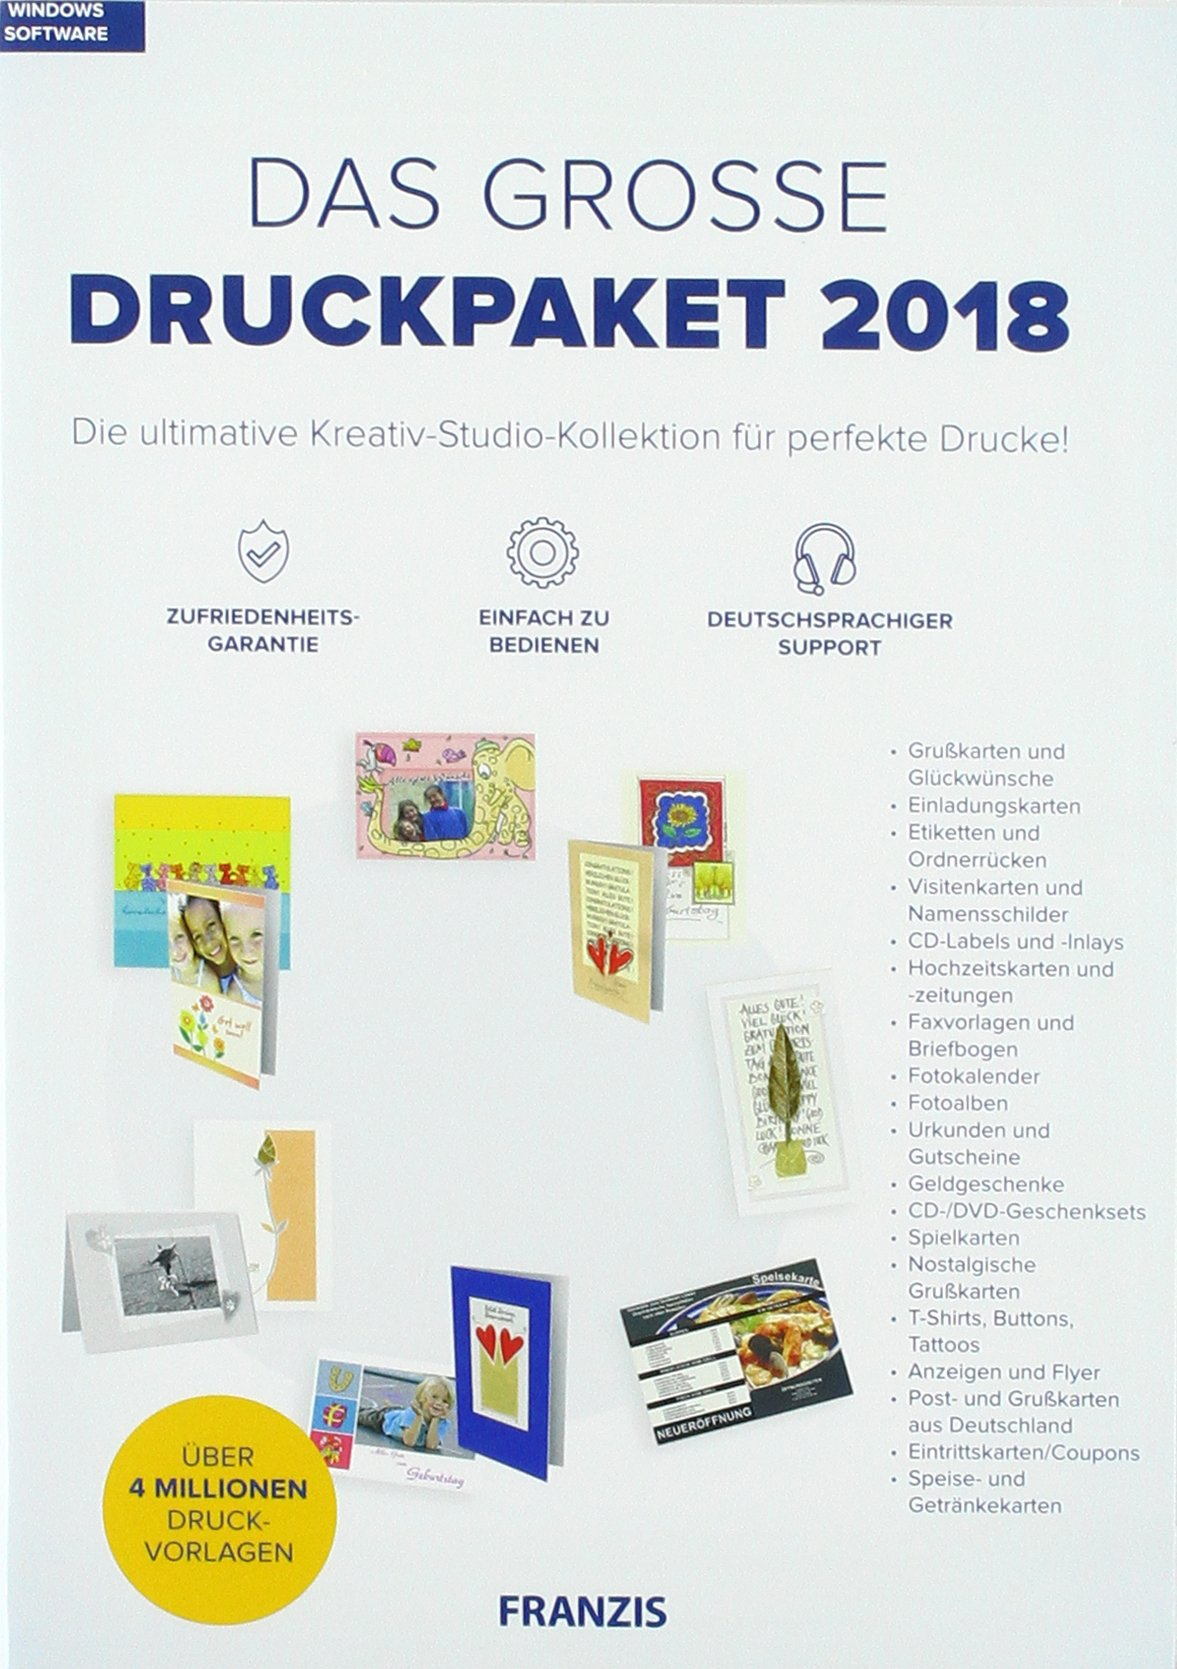 Das große druckpaket 2018 german dvd rom